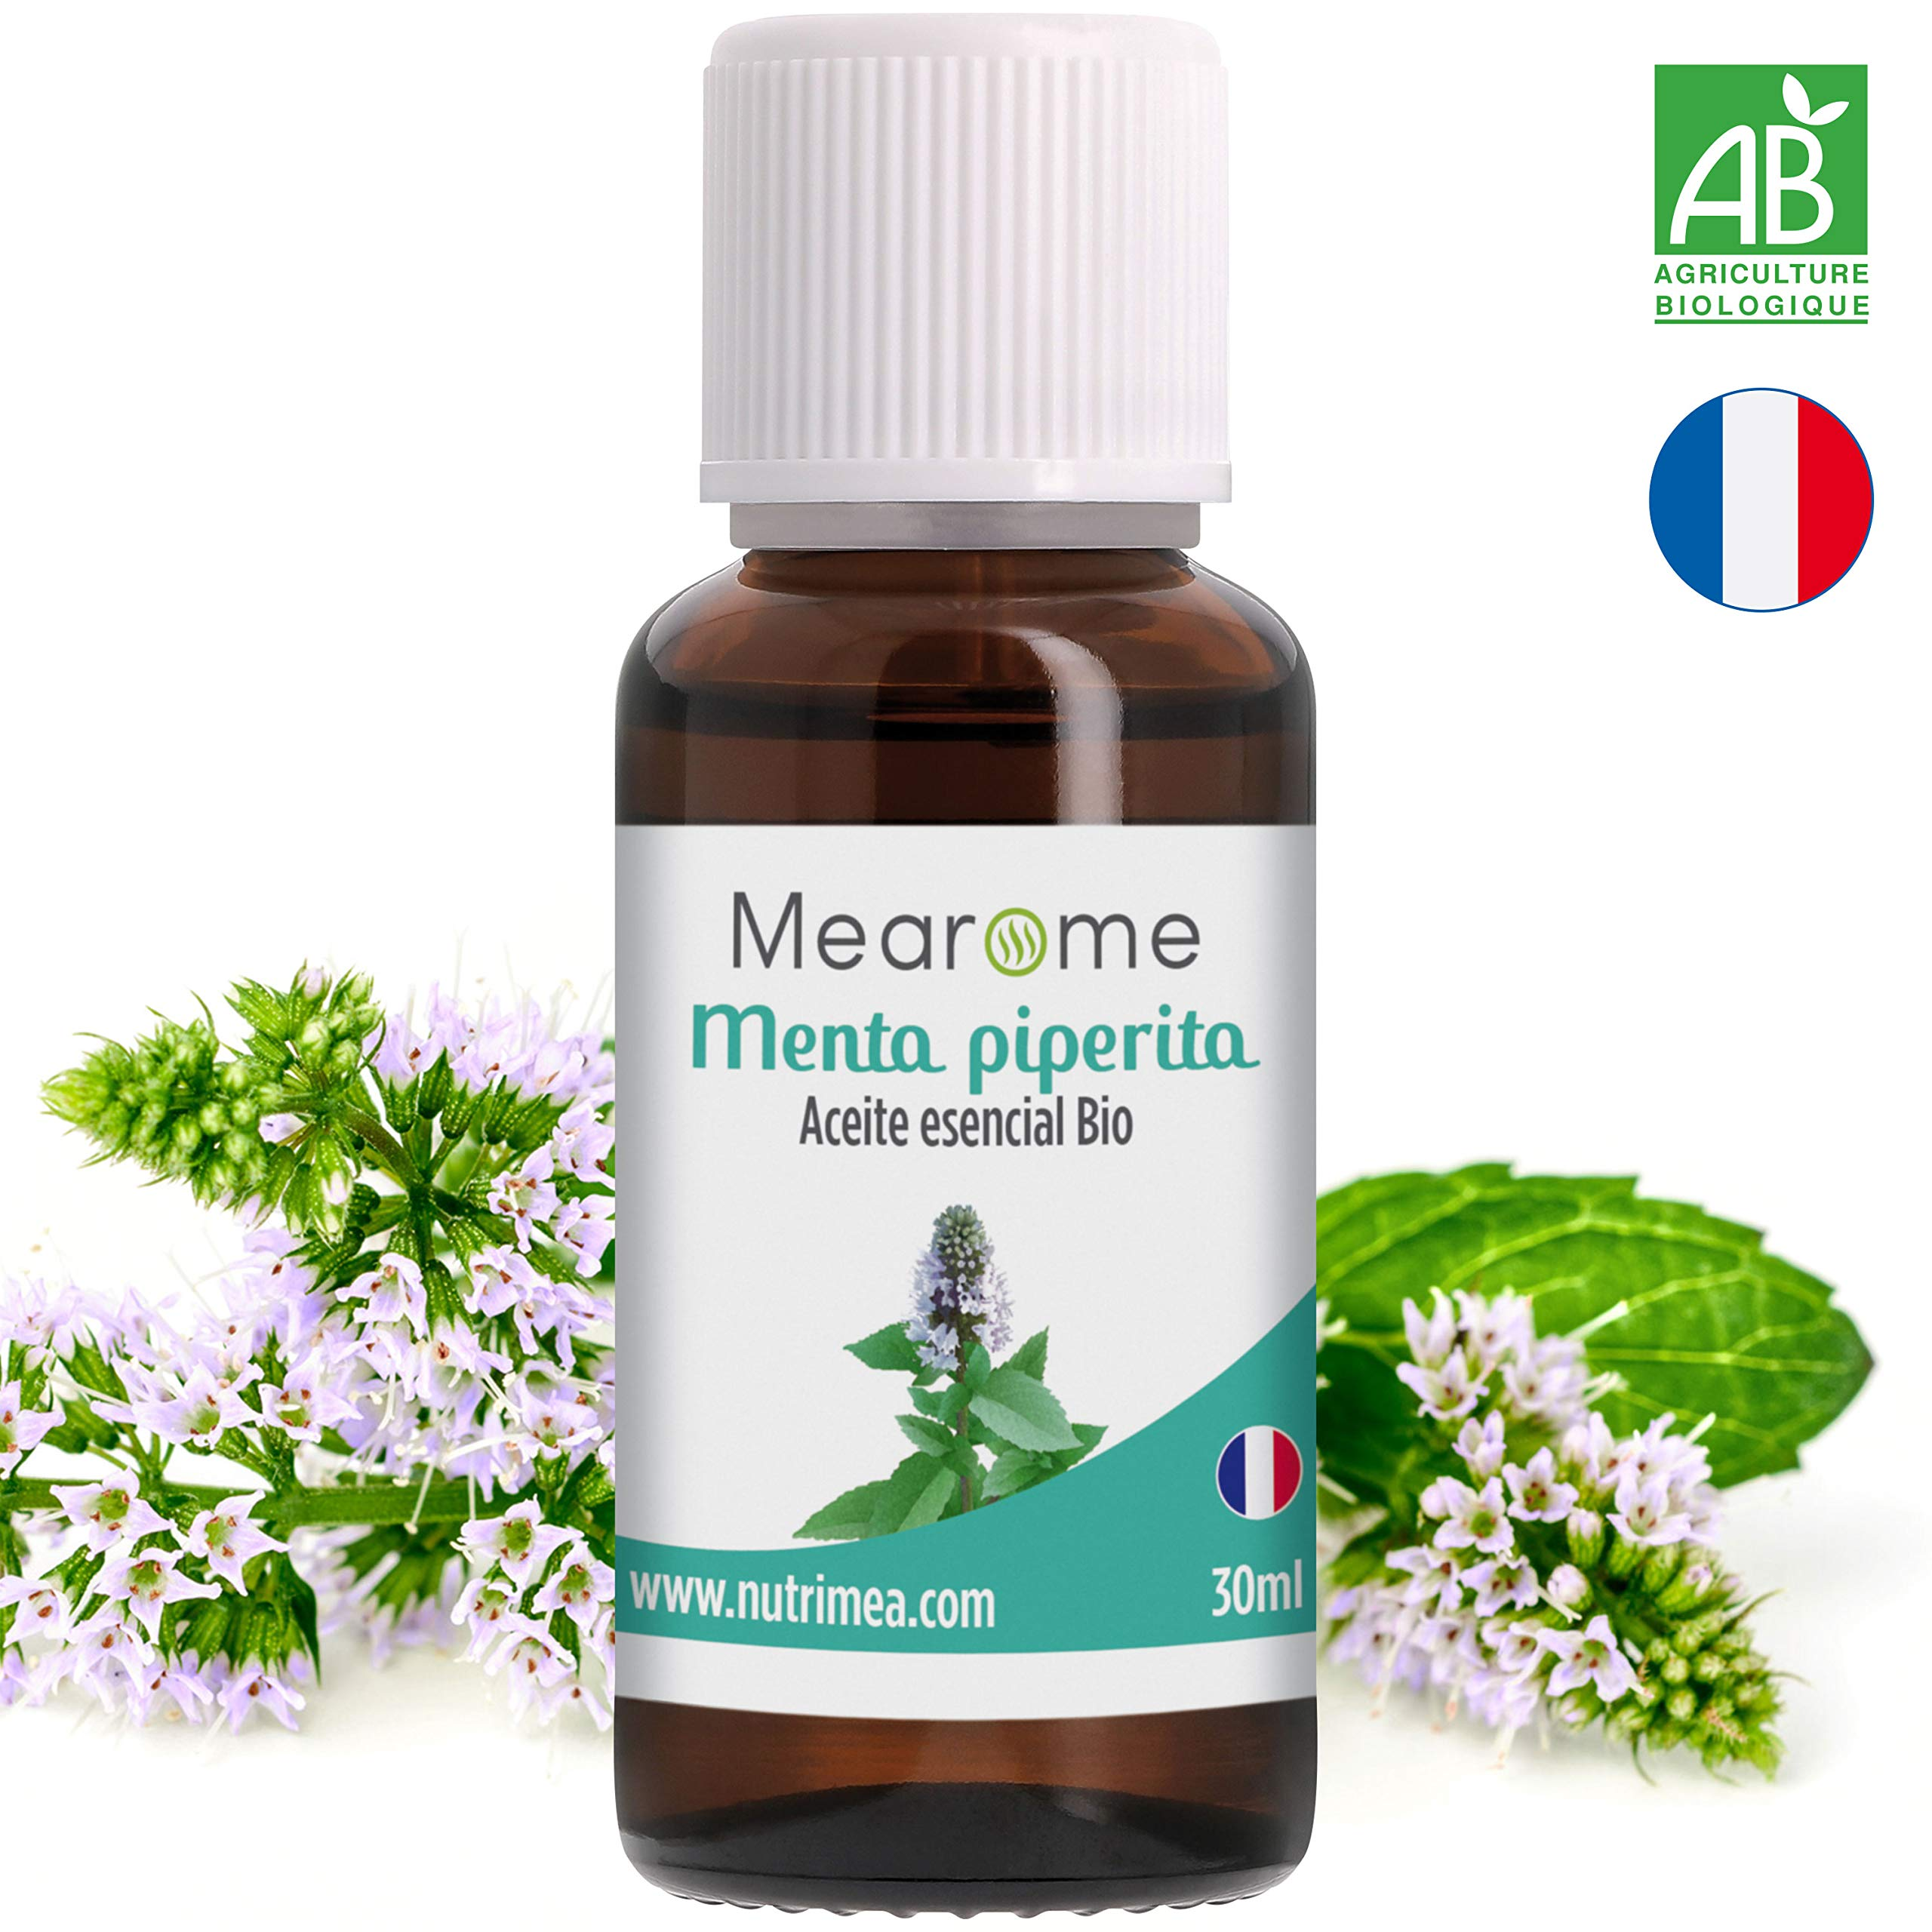 Aceite Esencial De Menta Piperita Puro Aceite Esencial Bio 30ml Quimitipado Grado Terapéutico Ideal Humidificador Ultrasónico